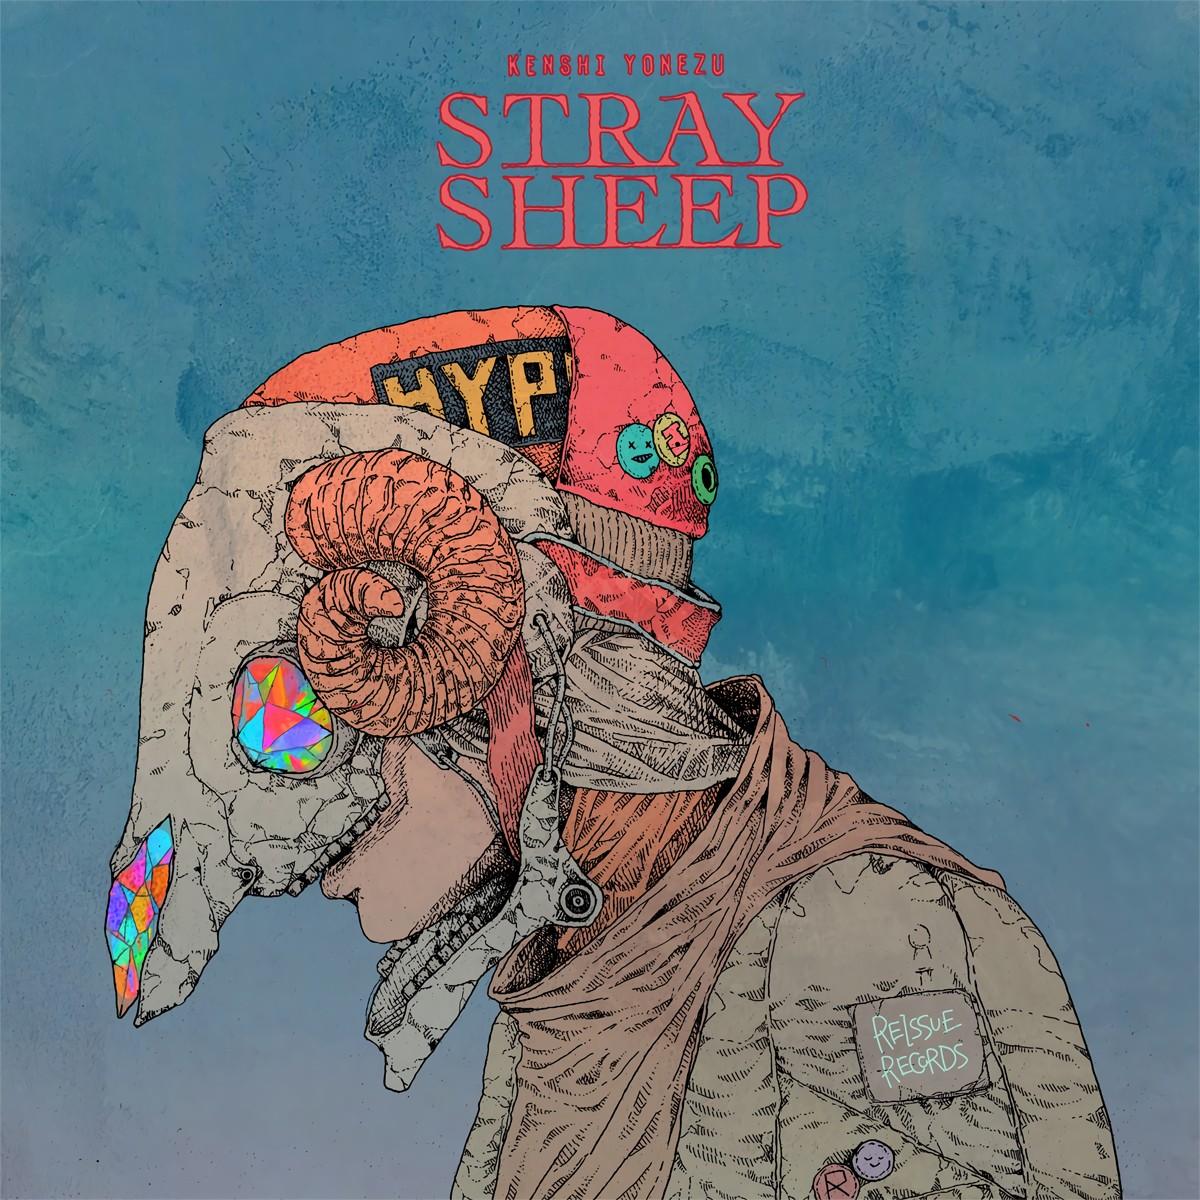 米津玄師 (Kenshi Yonezu) – STRAY SHEEP [CD FLAC + Blu-rayISO] [2020.08.05]